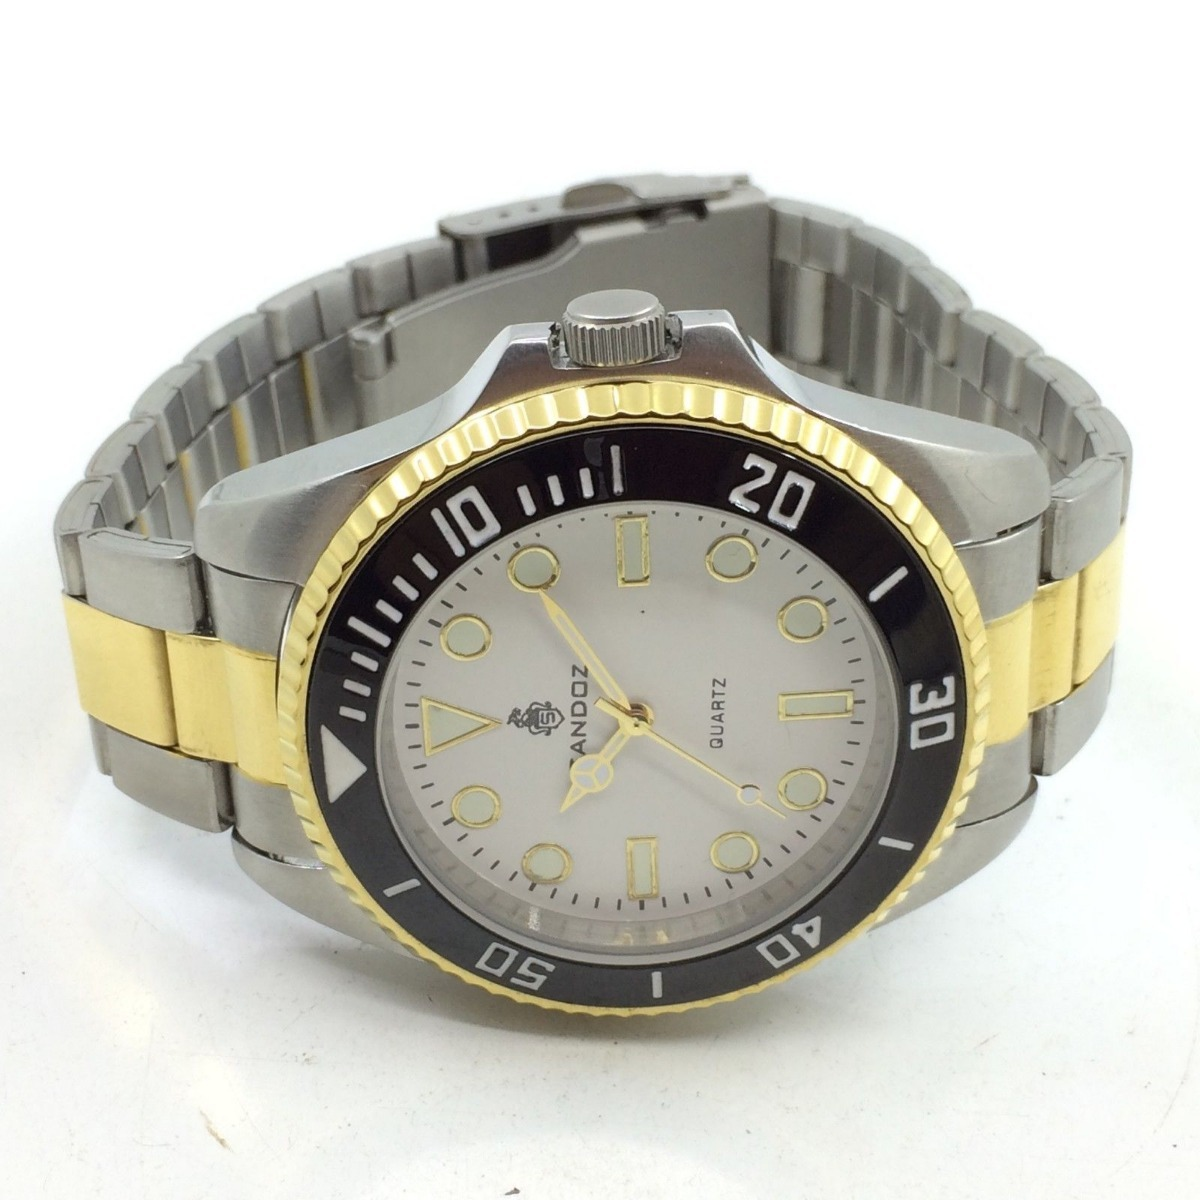 091fa38c7e0 Relógio Masculino Sandoz Quartz seiko